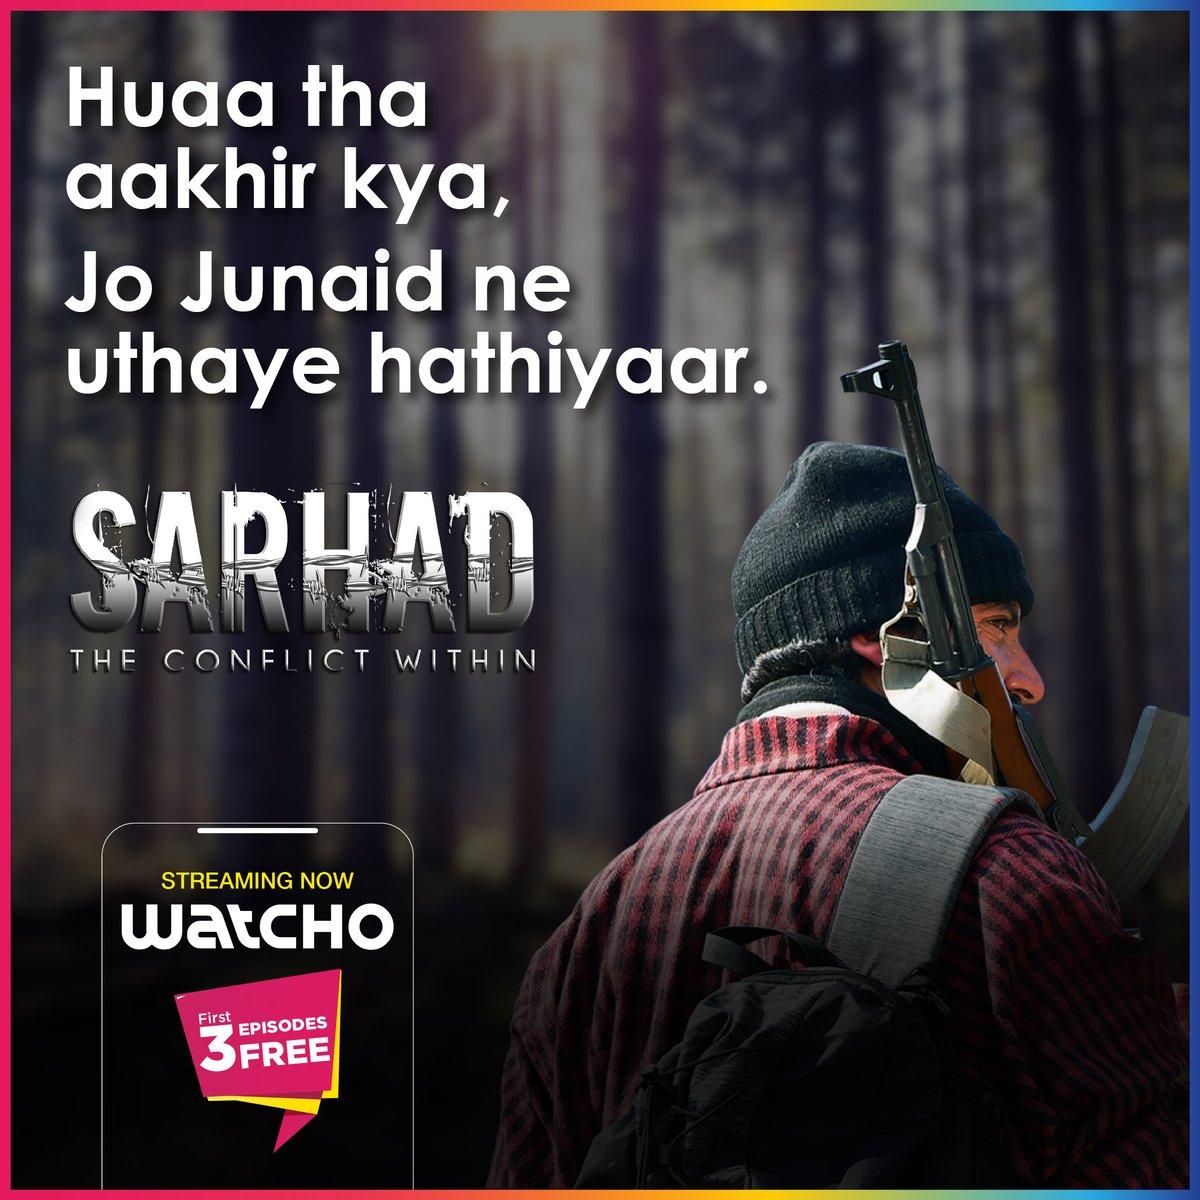 Jaaniye Junaid ka guzra kal kaisa tha. Sarhad, streaming now on Watcho.  #LetsWatcho #Watcho #patriotism  #MustWatch  #HappyRepublicDay #Nationalism  #love #patriots #national #proudindian  @DishTV_India @officiald2h @PerceptPictures